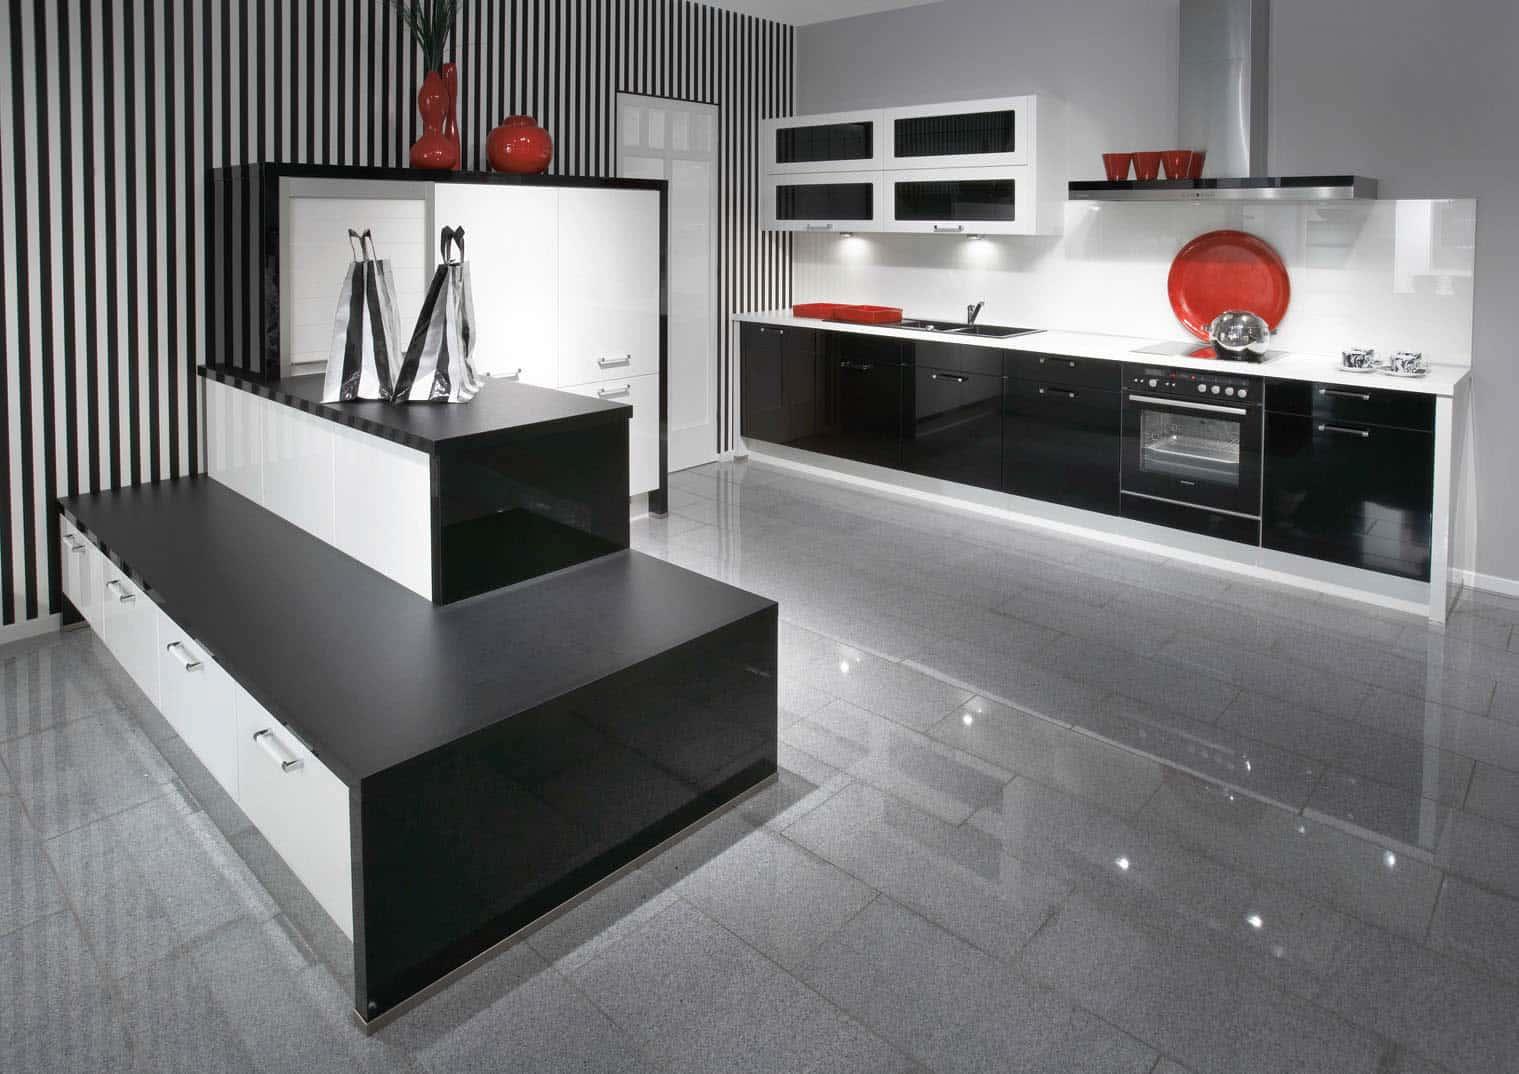 Desain dapur minimalis monokrom bergaris - Thegorbalsla